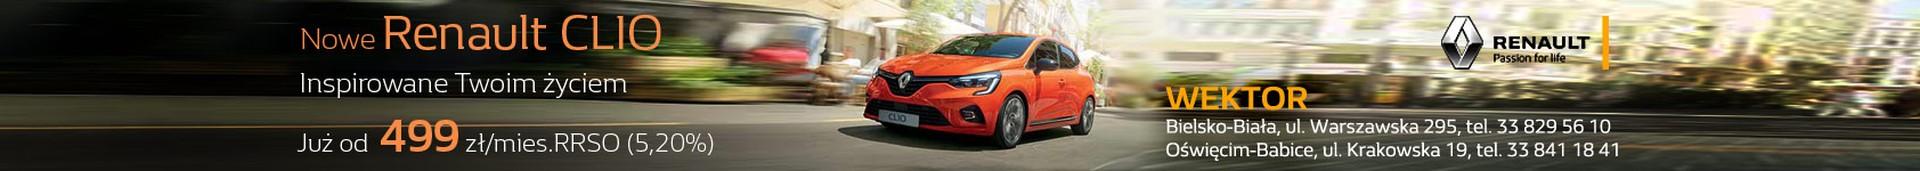 Renault Clio Wektor